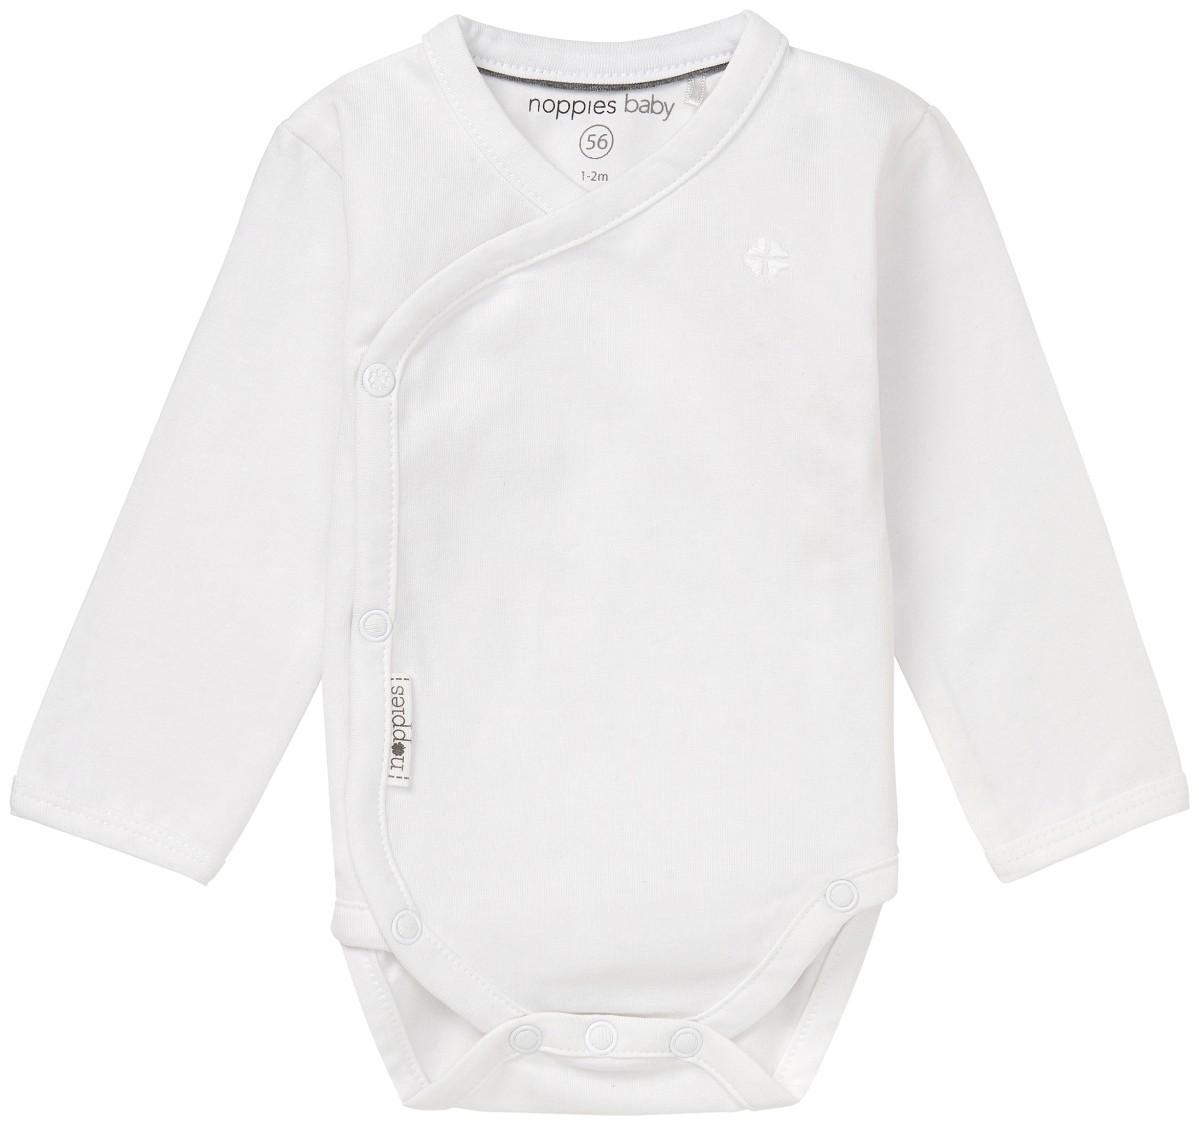 Noppies - Babypakje Ziara White - 0M